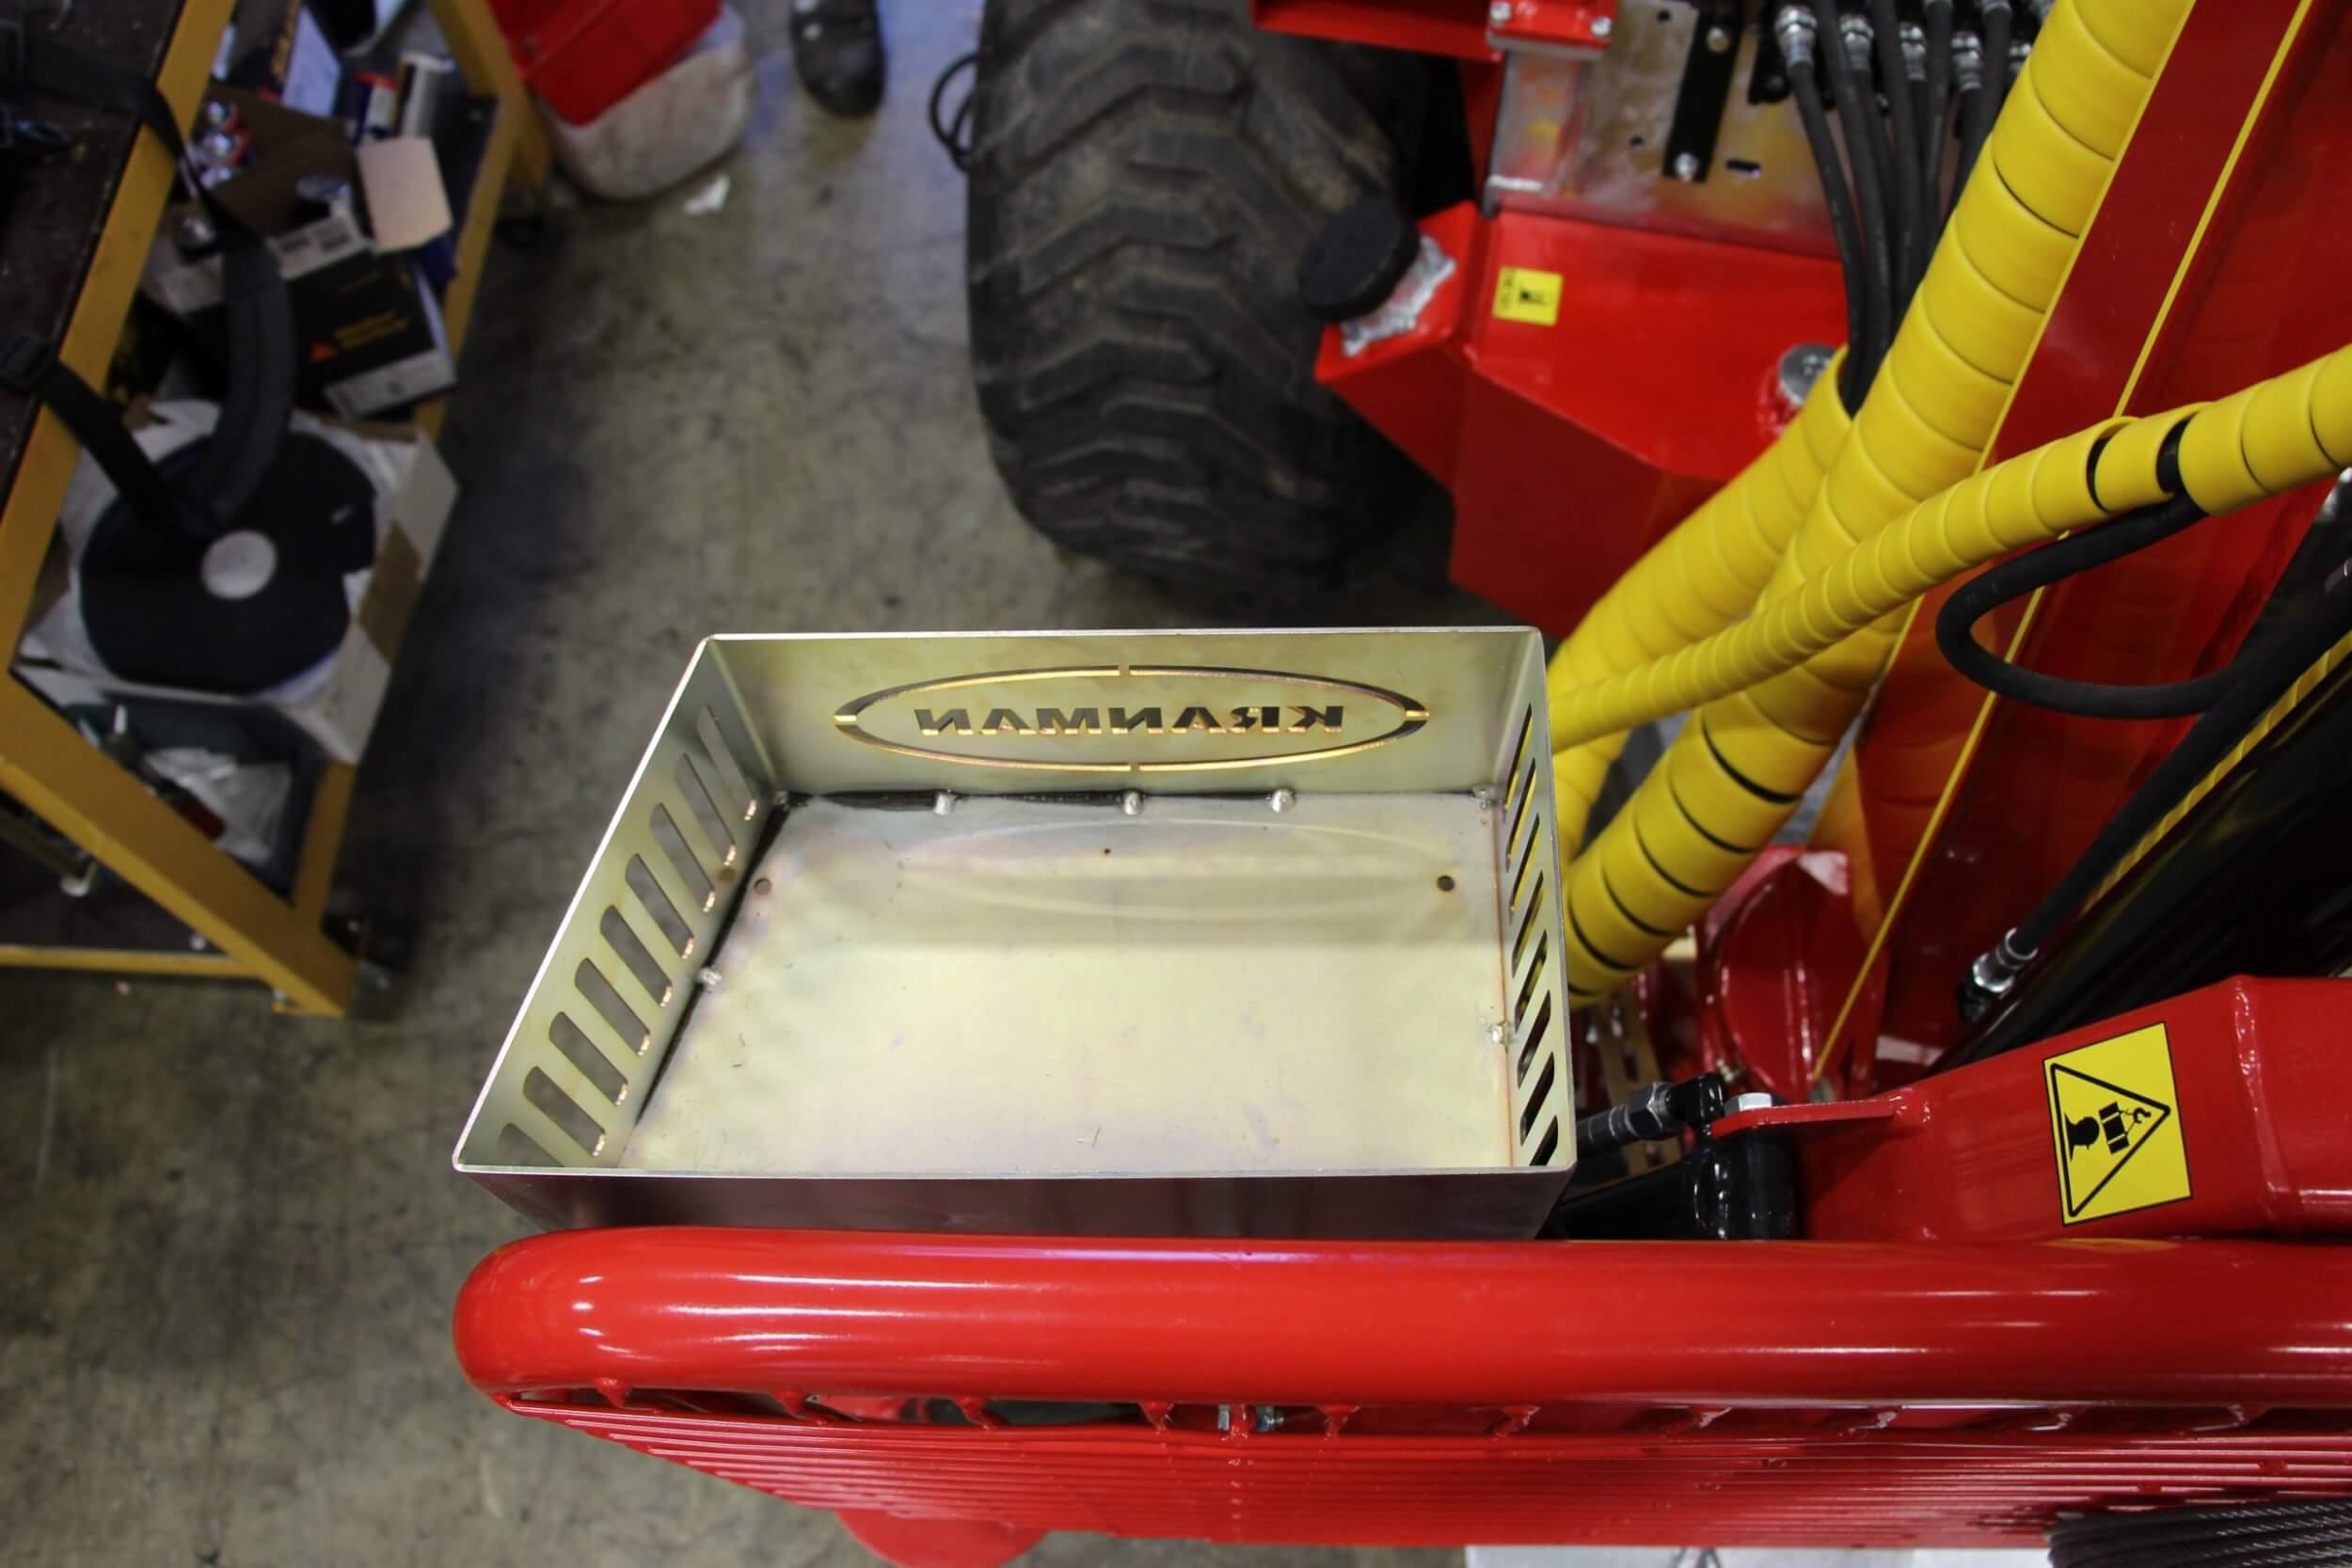 BK-FK3 Förvaringslåda monterad på grind